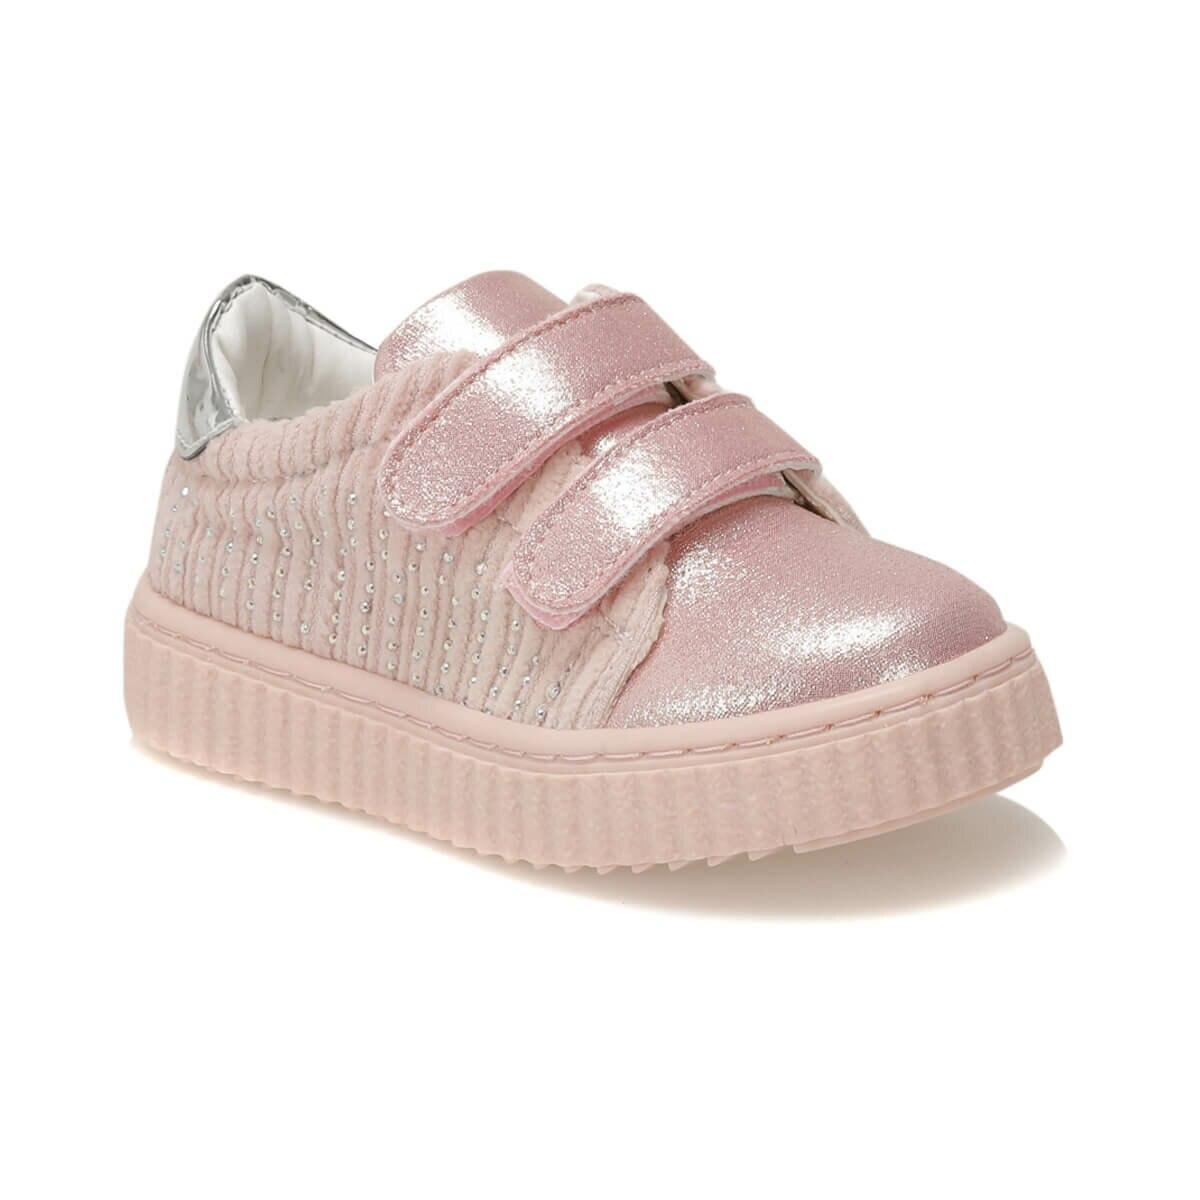 FLO 91.OBB I.B Powder Female Child Shoes PINKSTEP